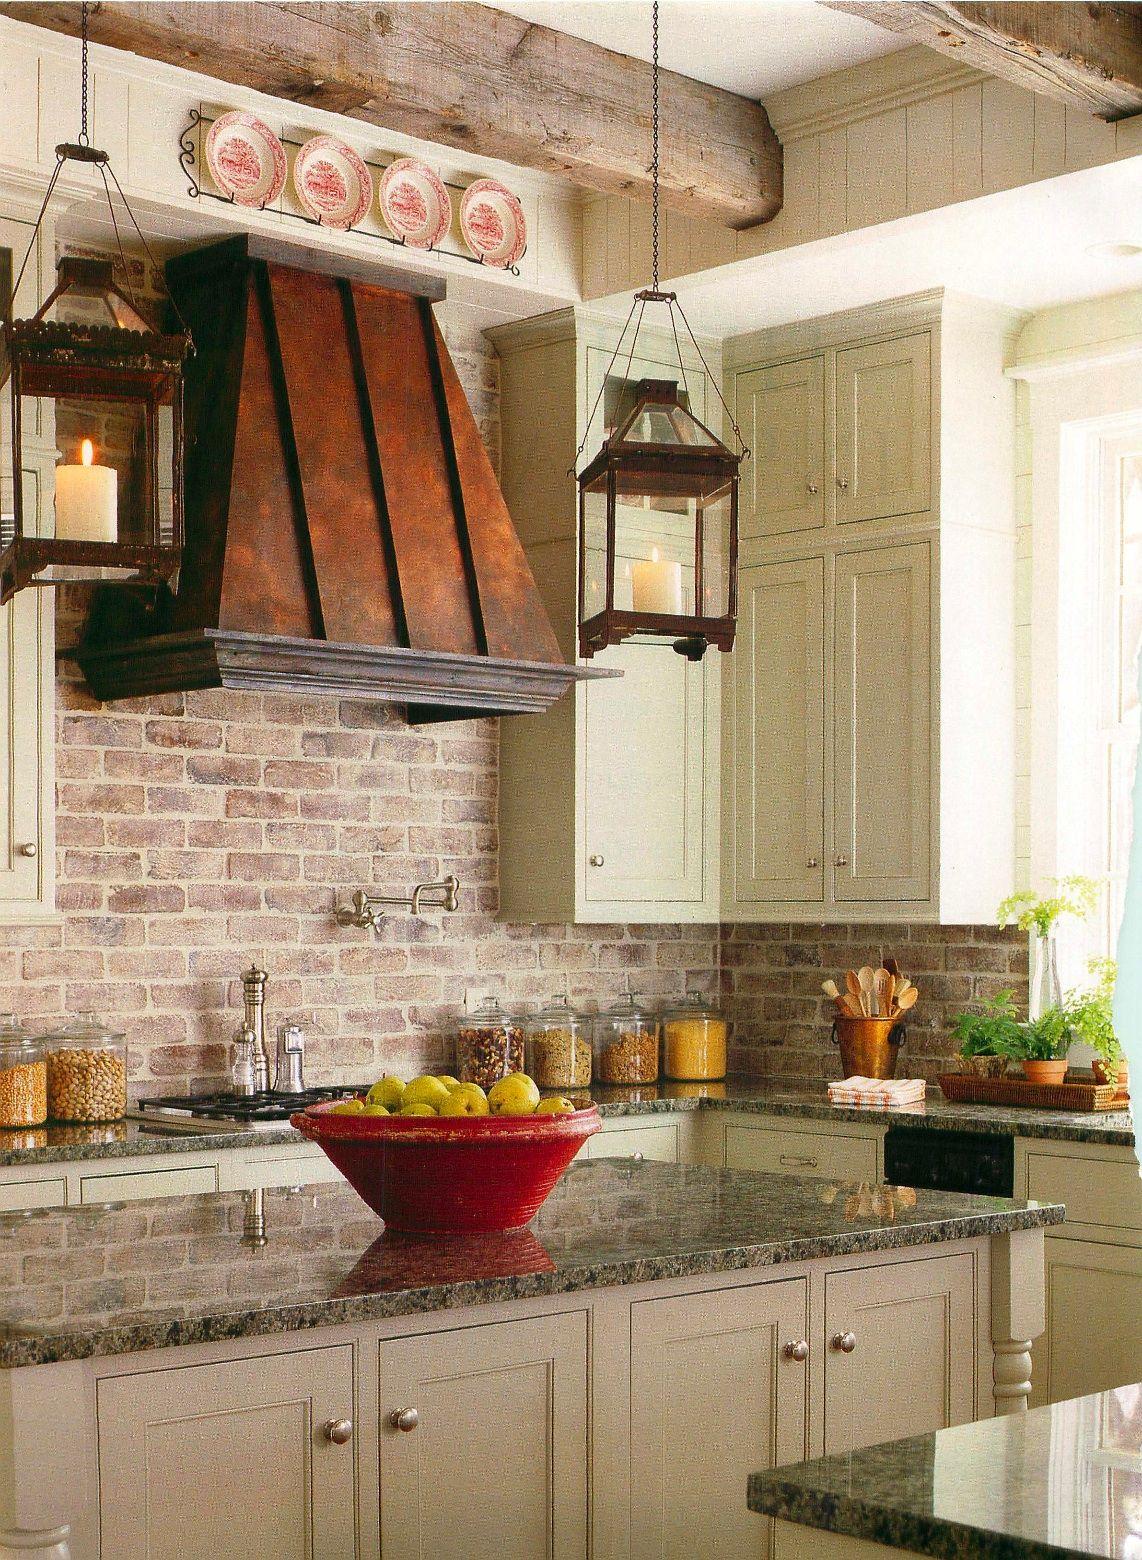 Brick Backsplashes Rustic And Full Of Charm Kitchen Backsplash